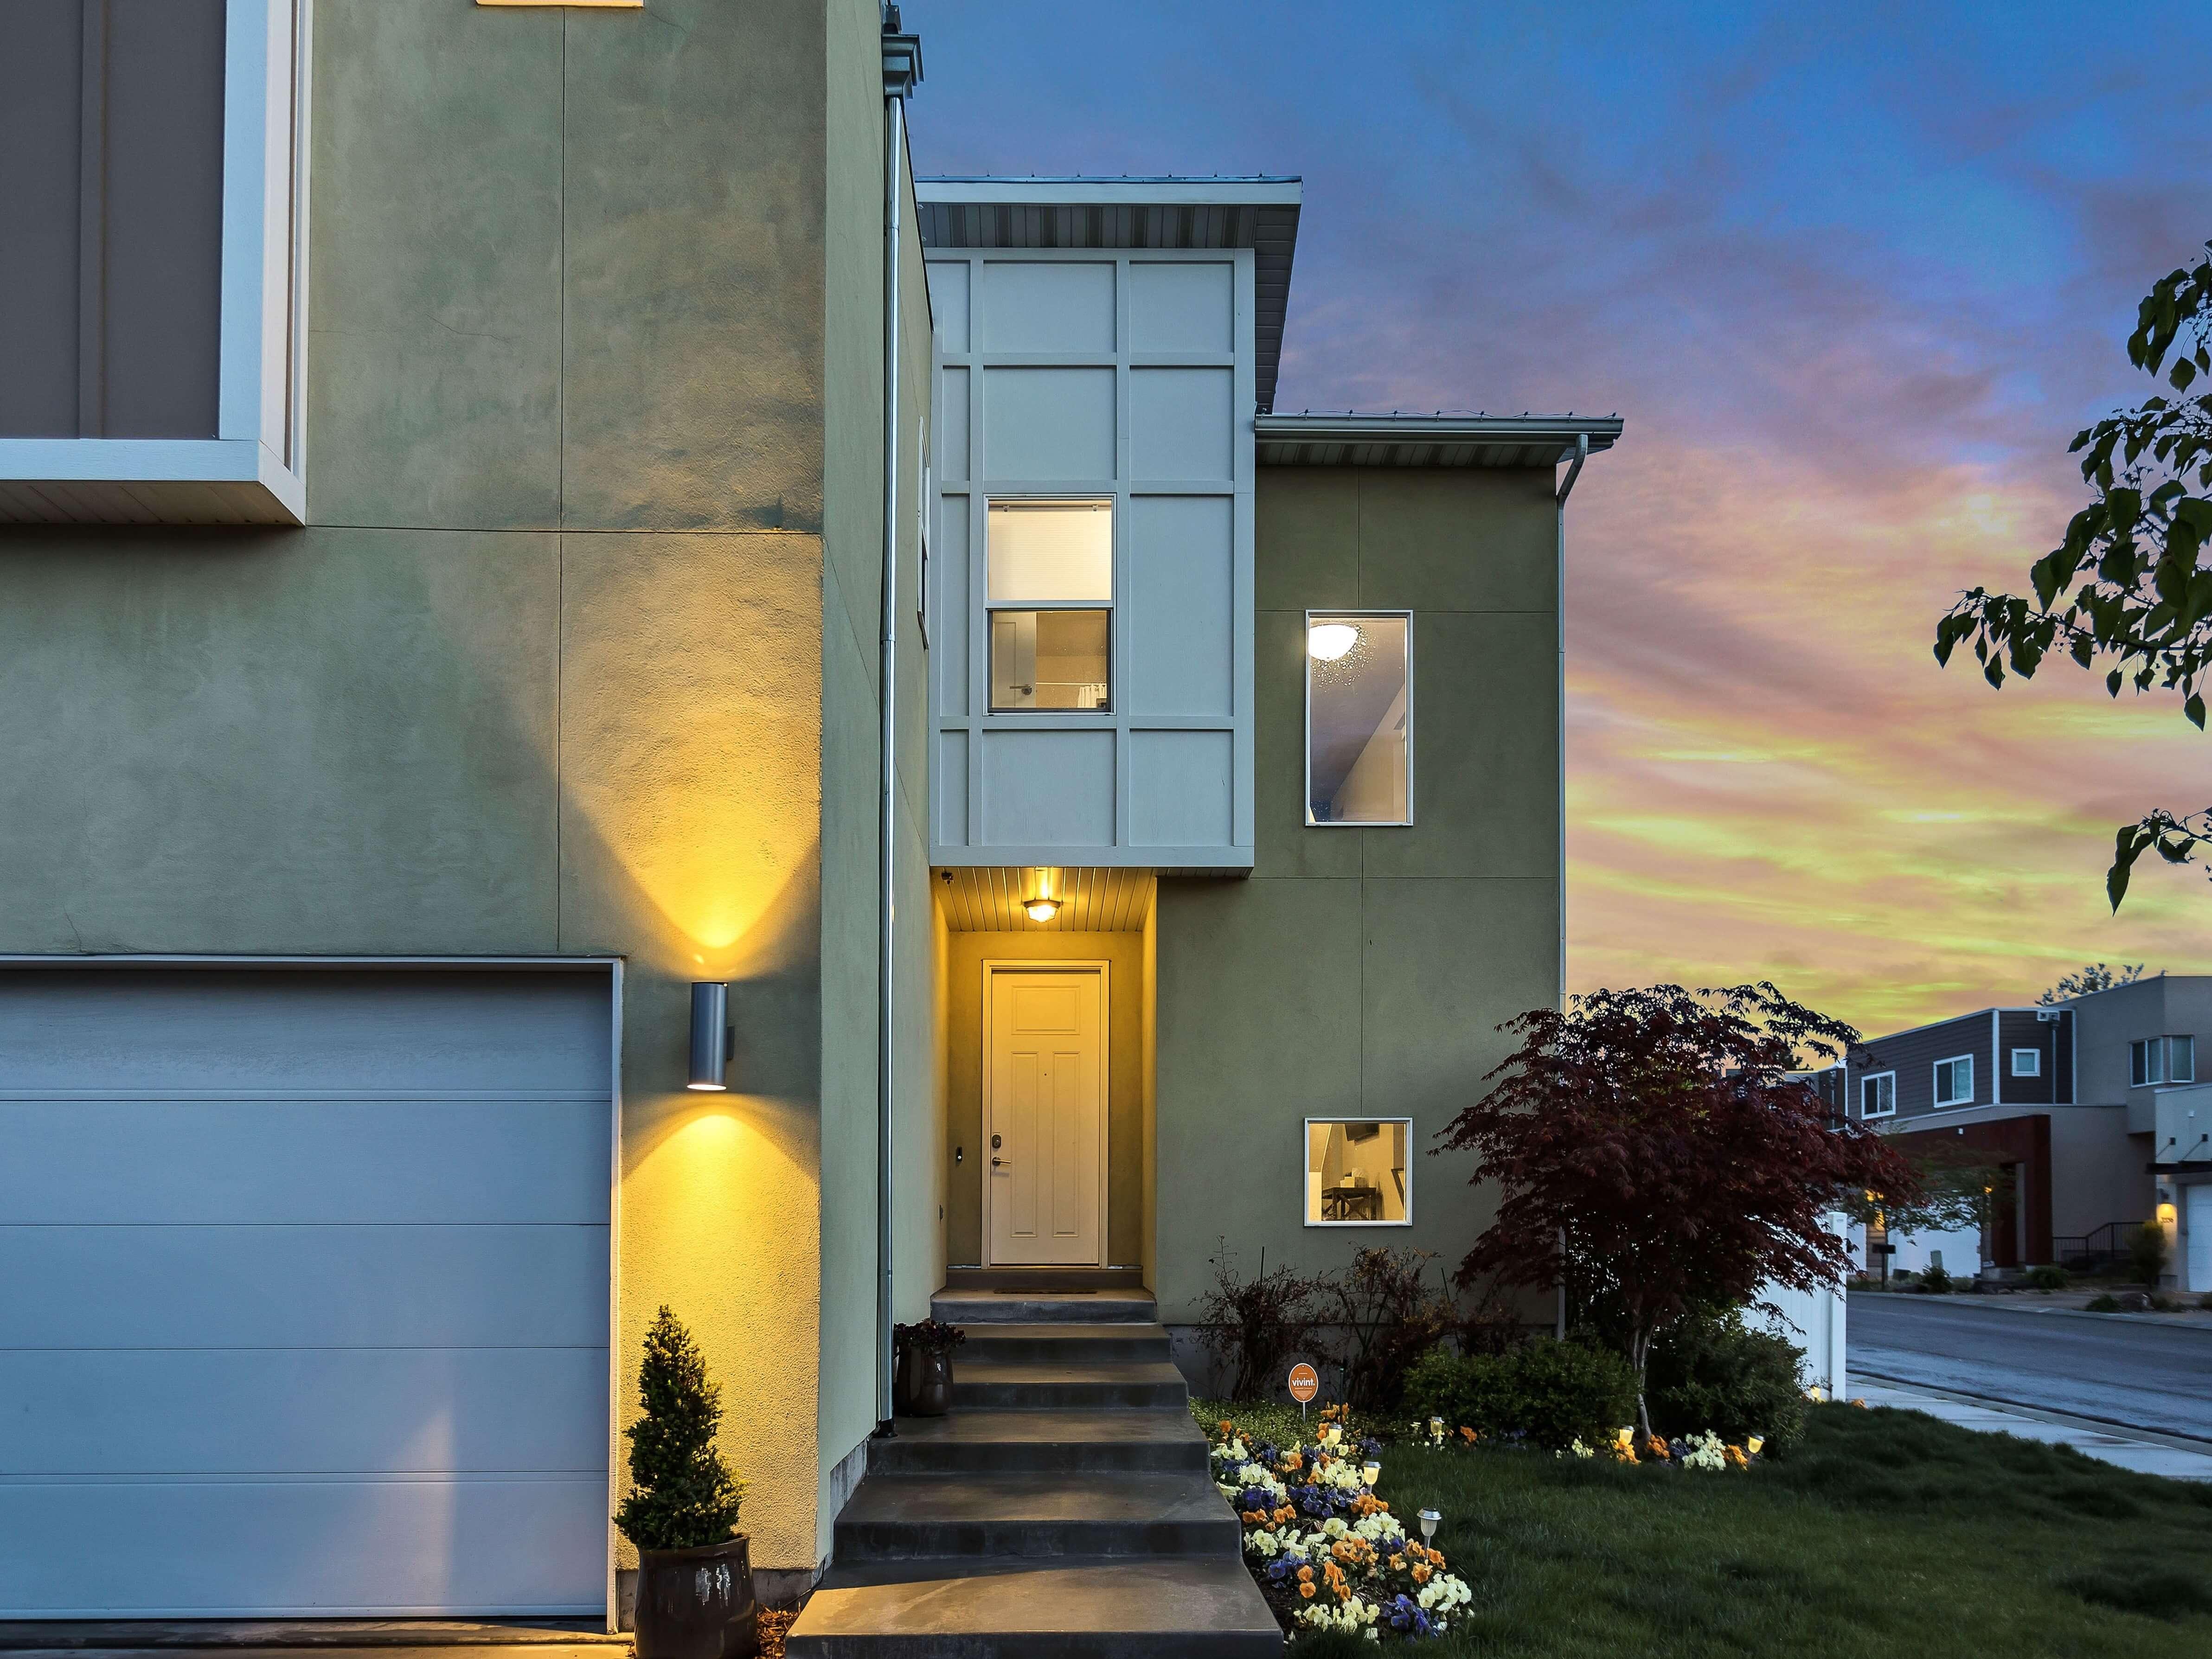 Xiaozhu Taps into Evolving Home-sharing Market